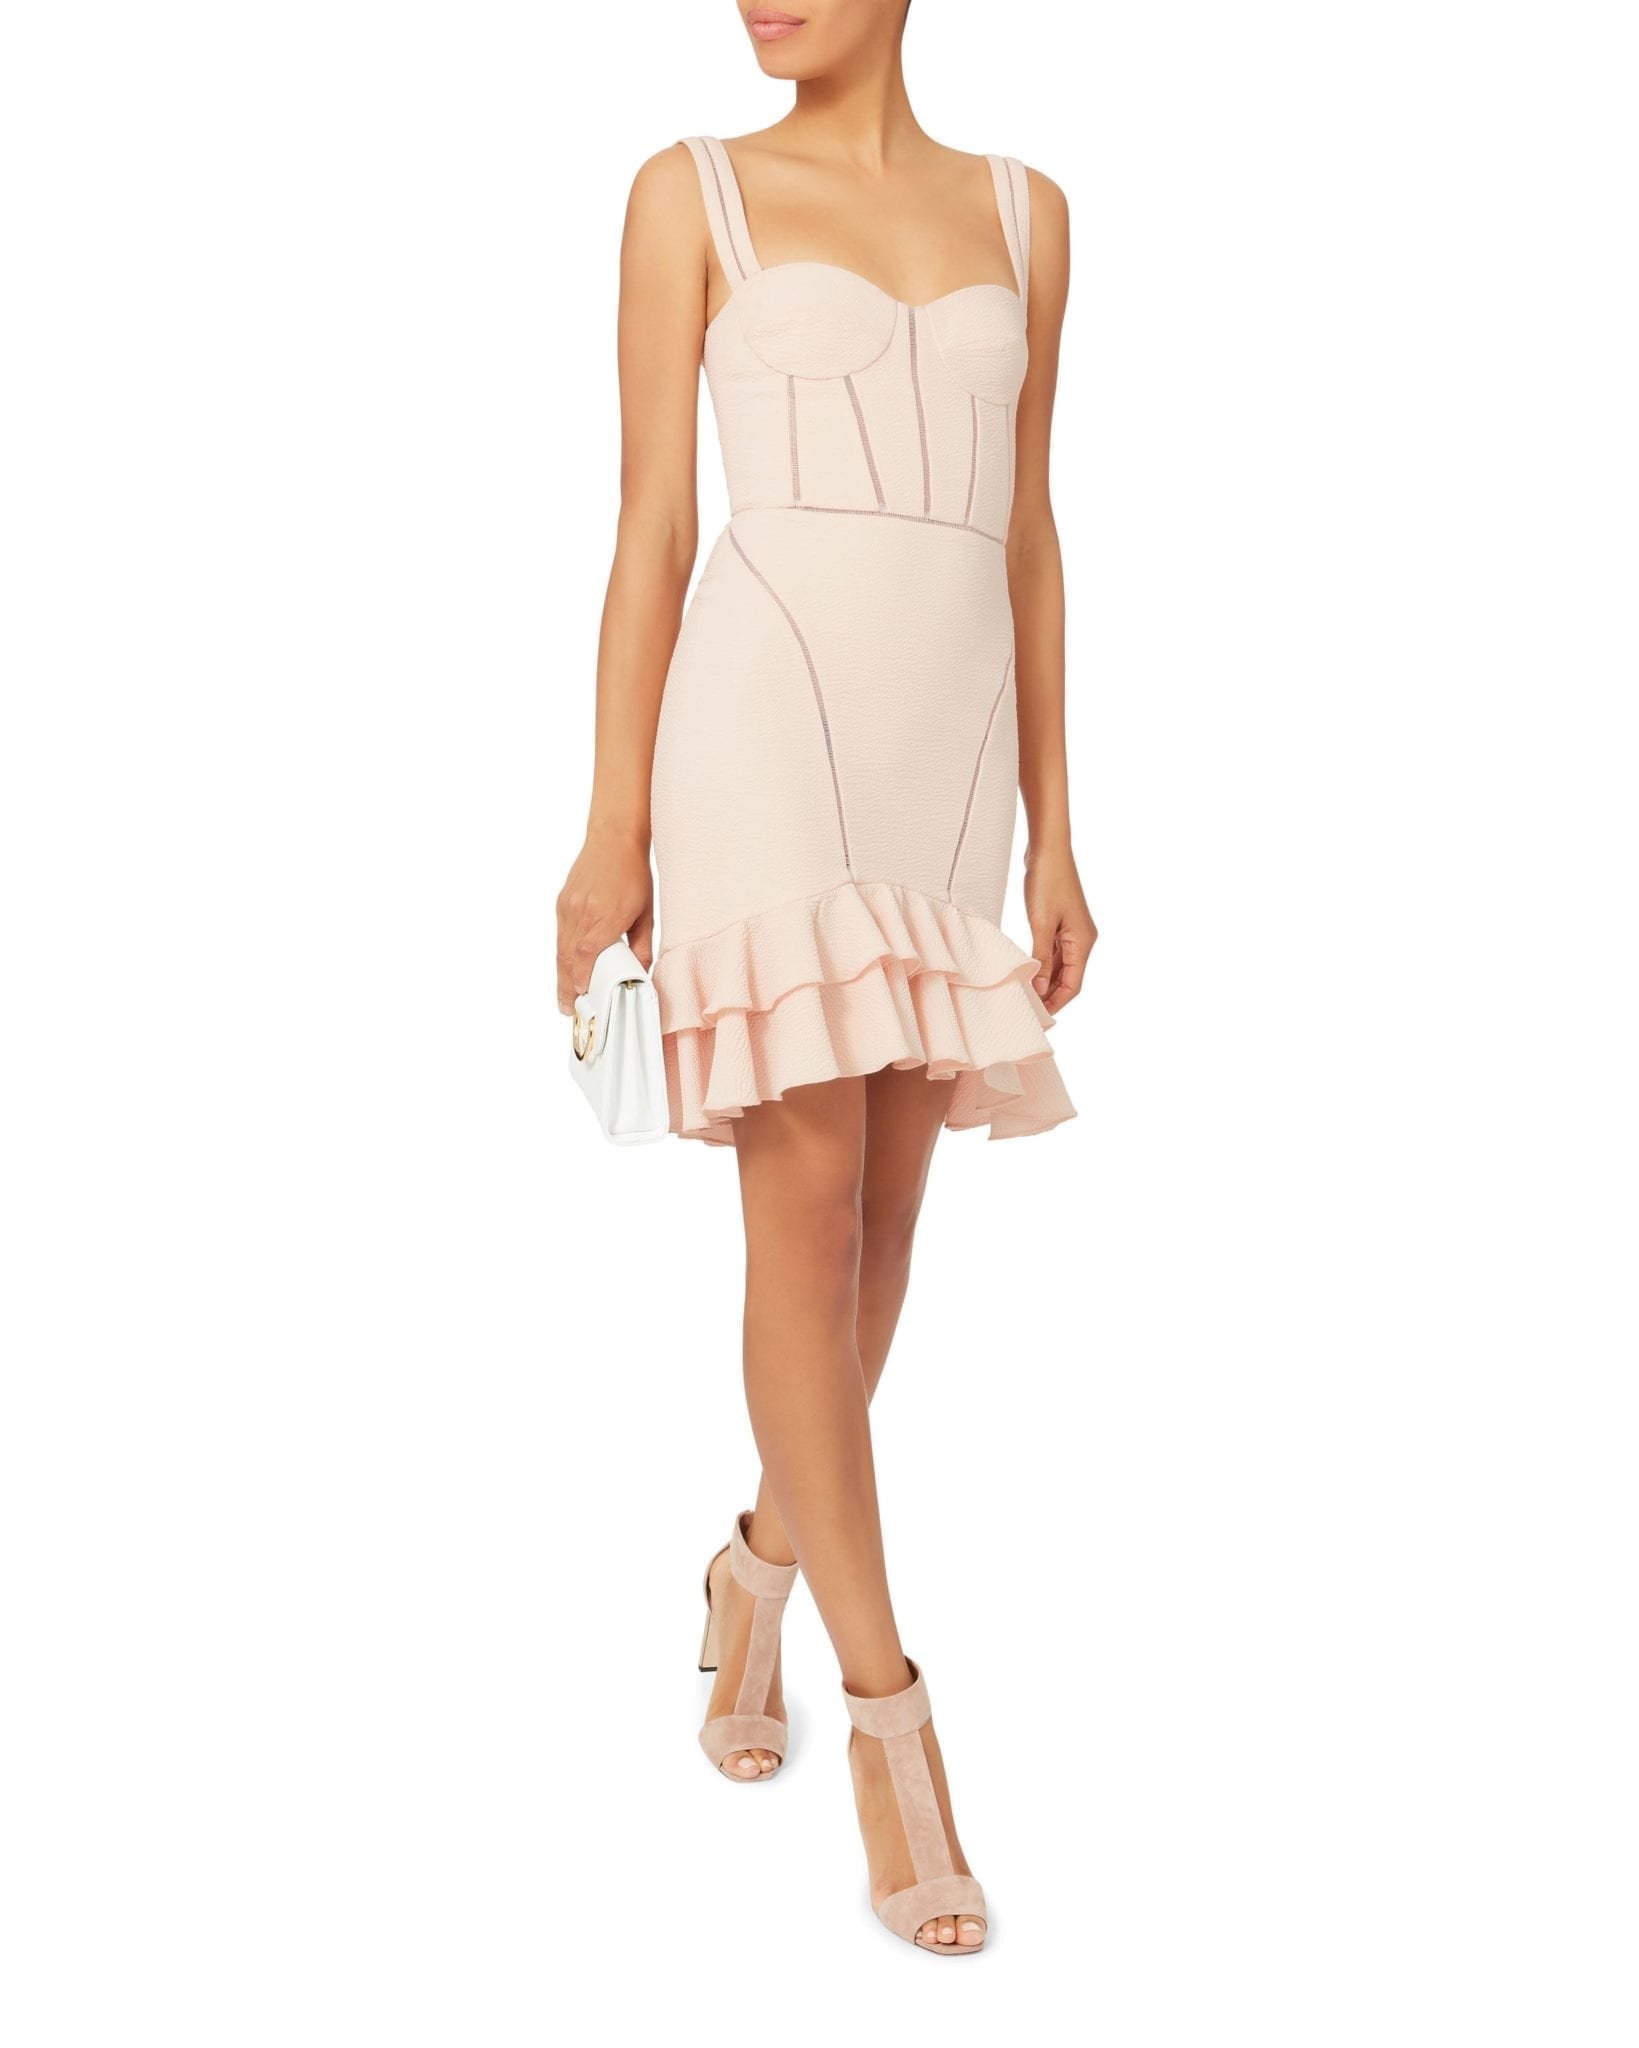 JONATHAN SIMKHAI Seersucker Bustier Mini Pink Dress